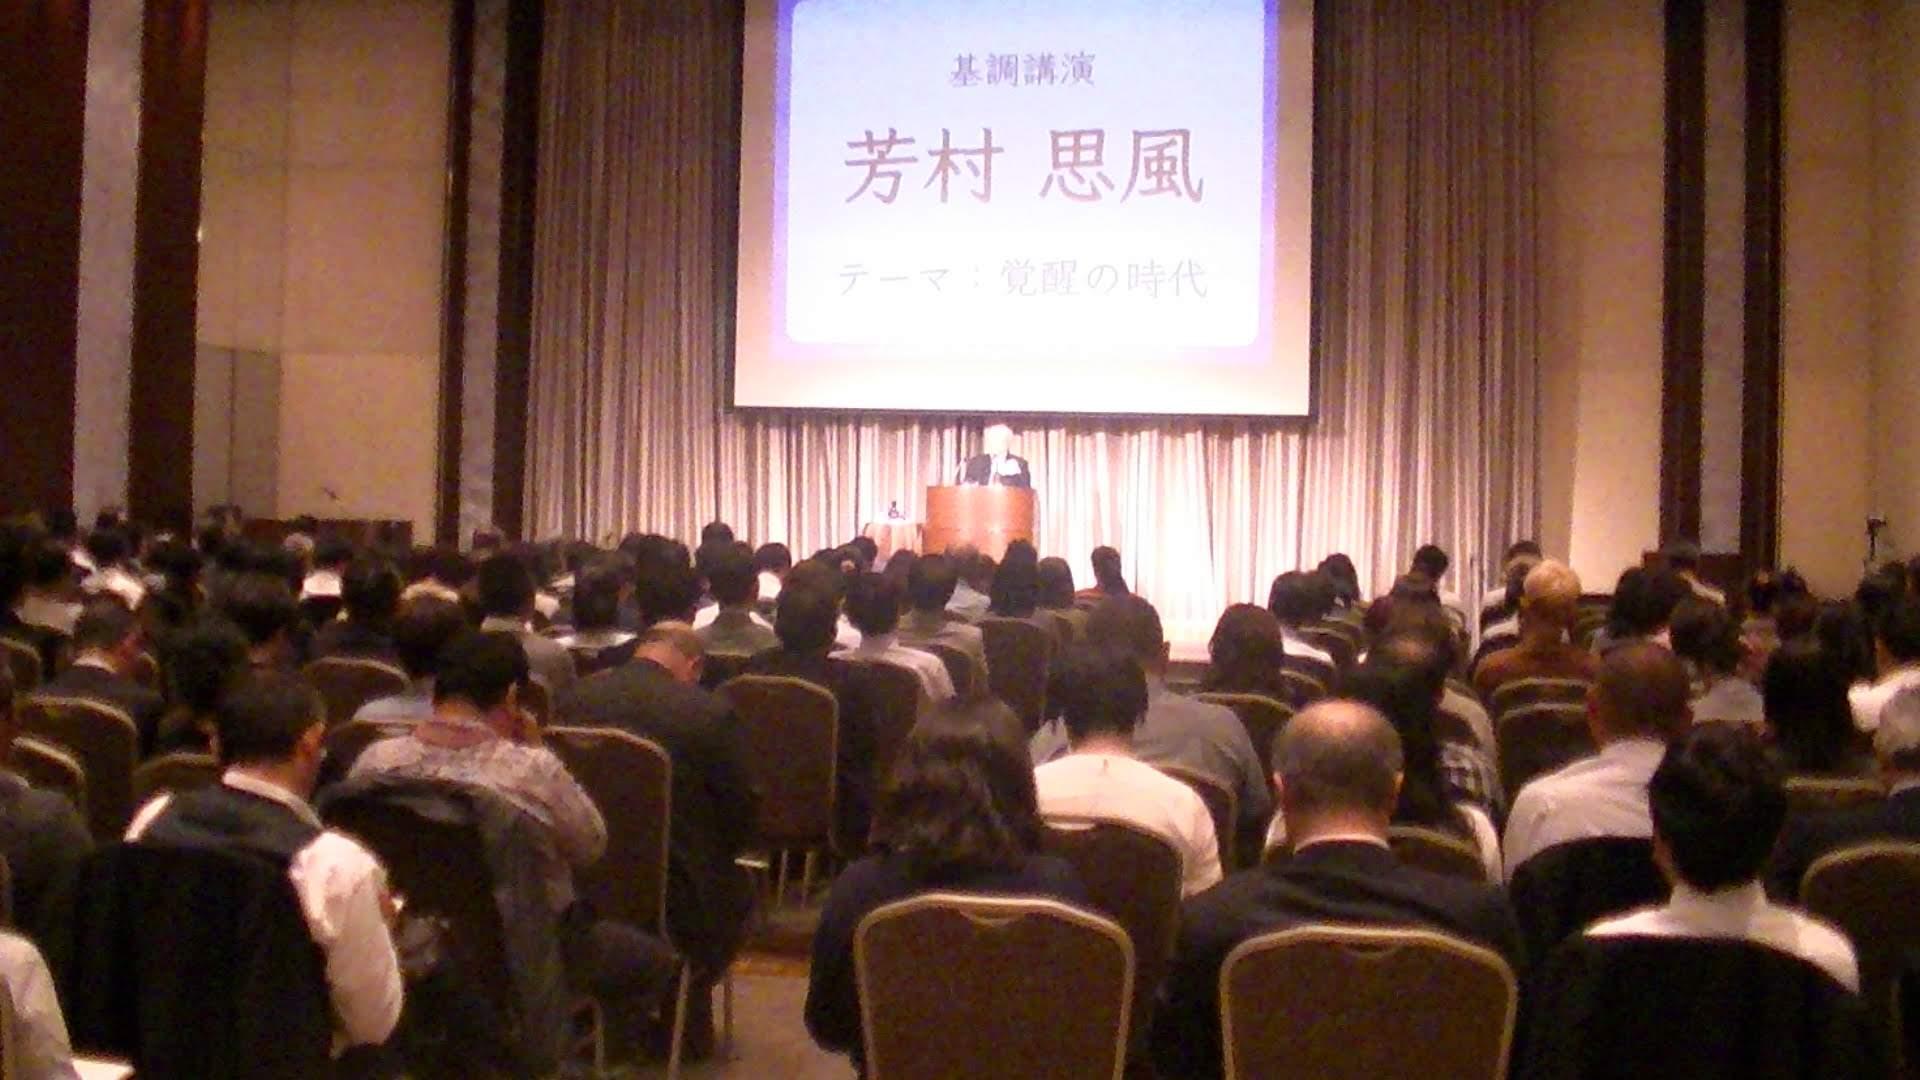 PIC 1717 1 - 思風会全国大会in広島